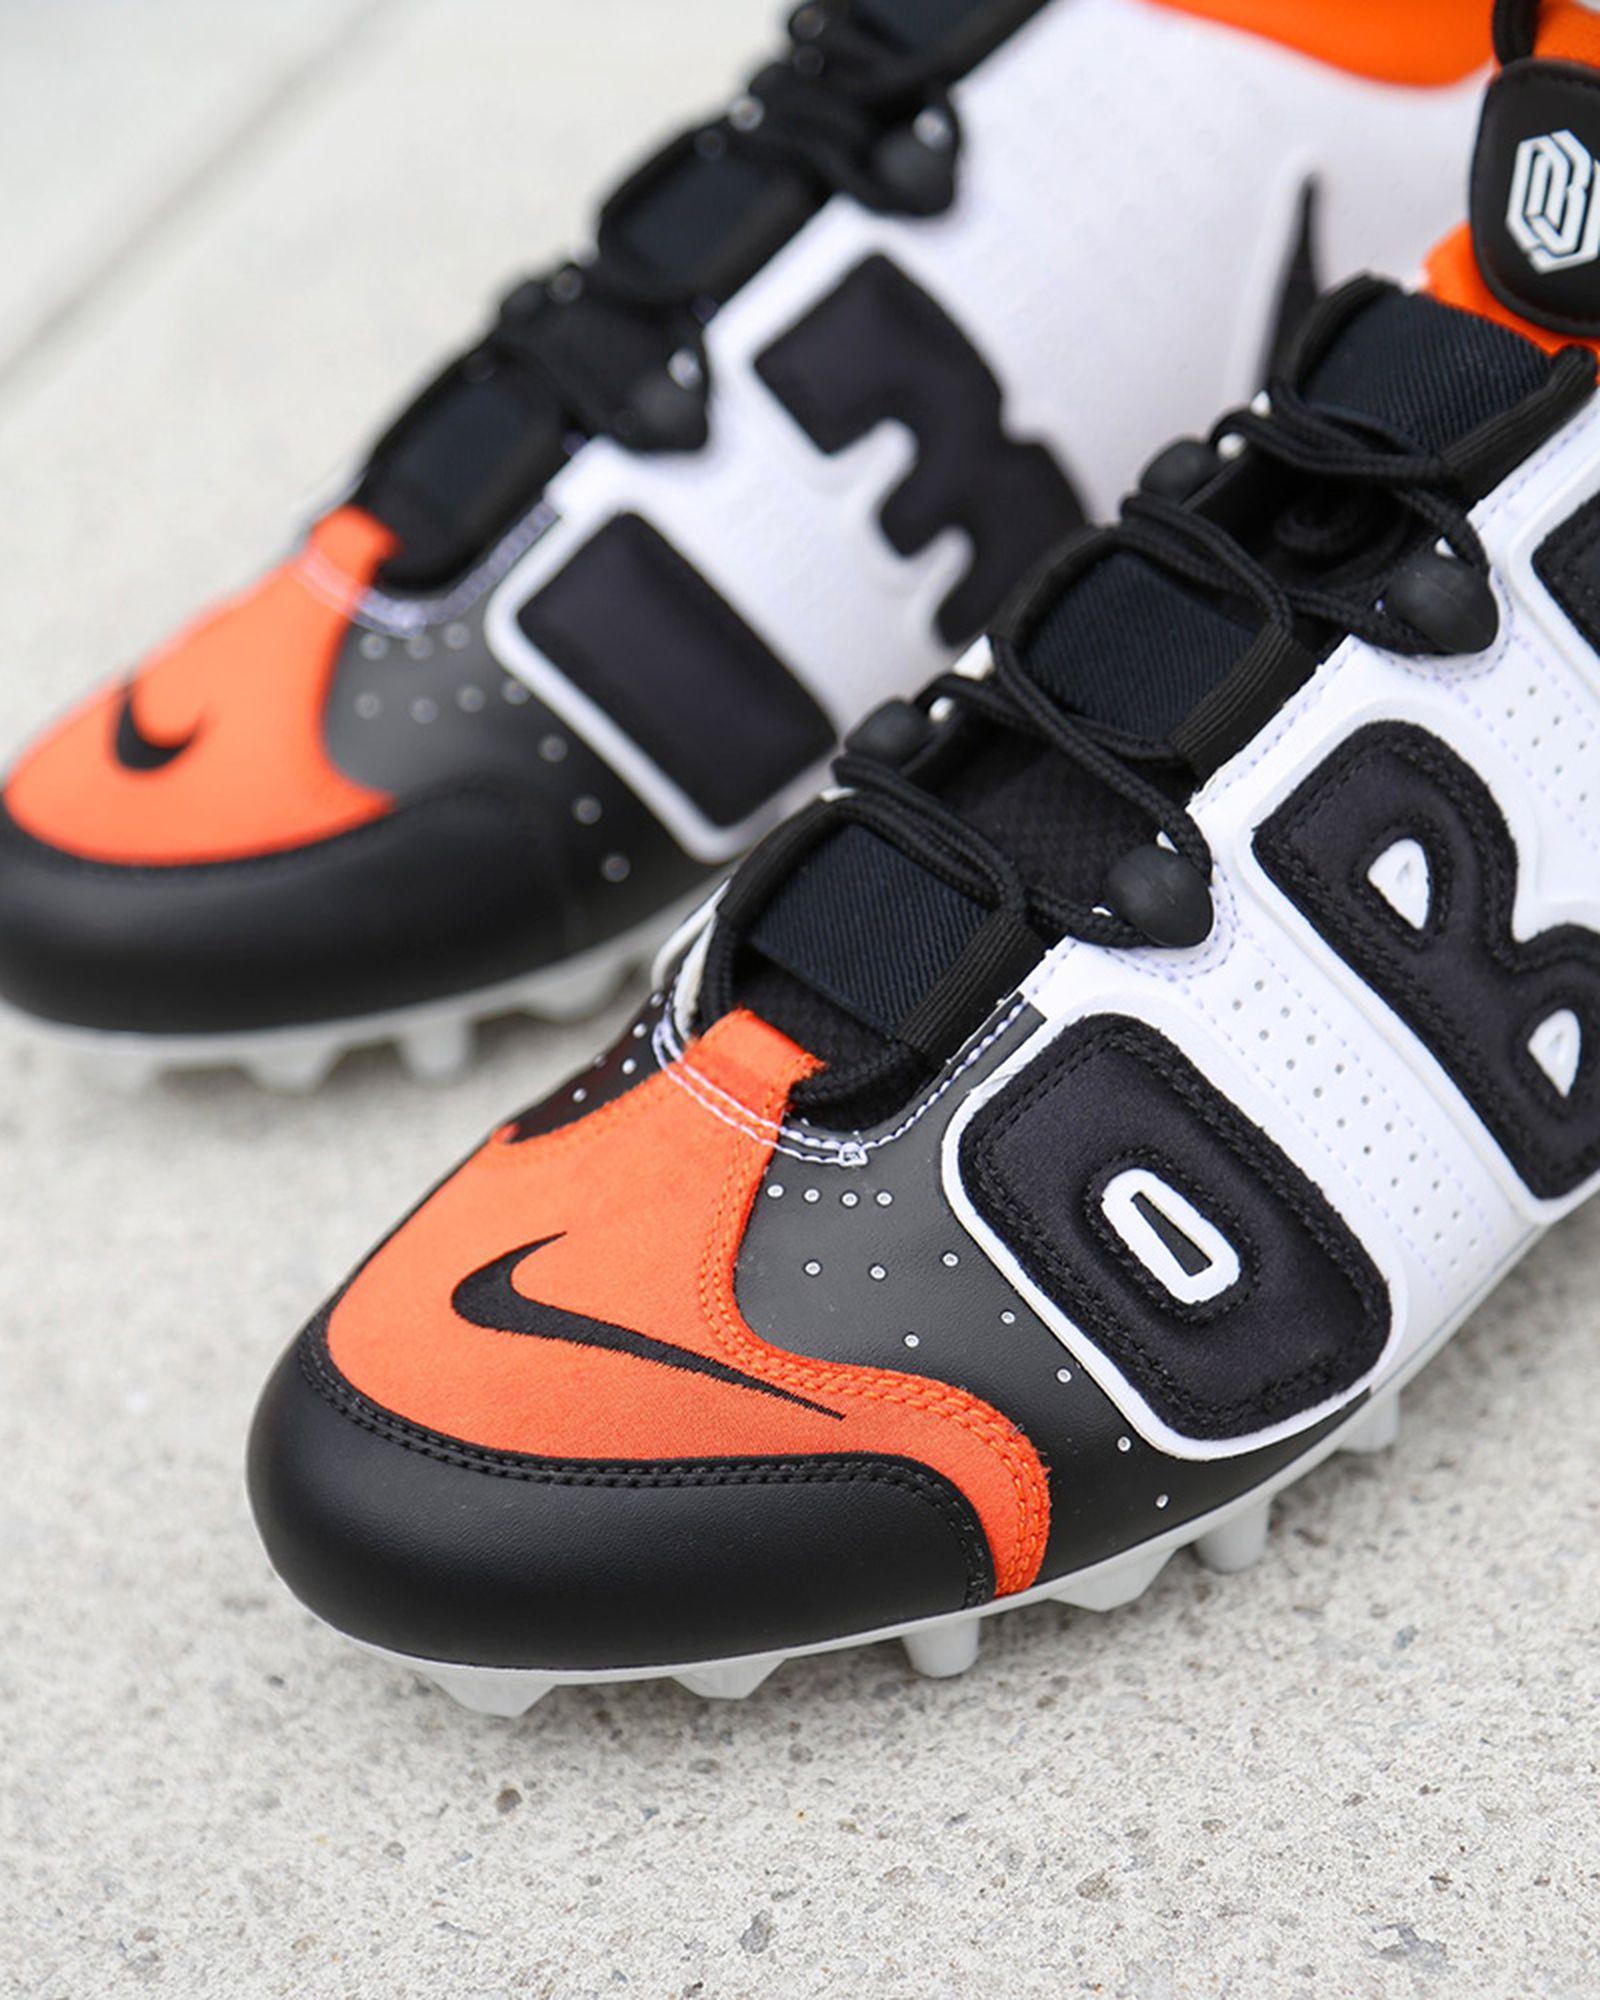 odell beckham jr shattered backboard pe cleats Nike OBJ Odell Beckham Jr.